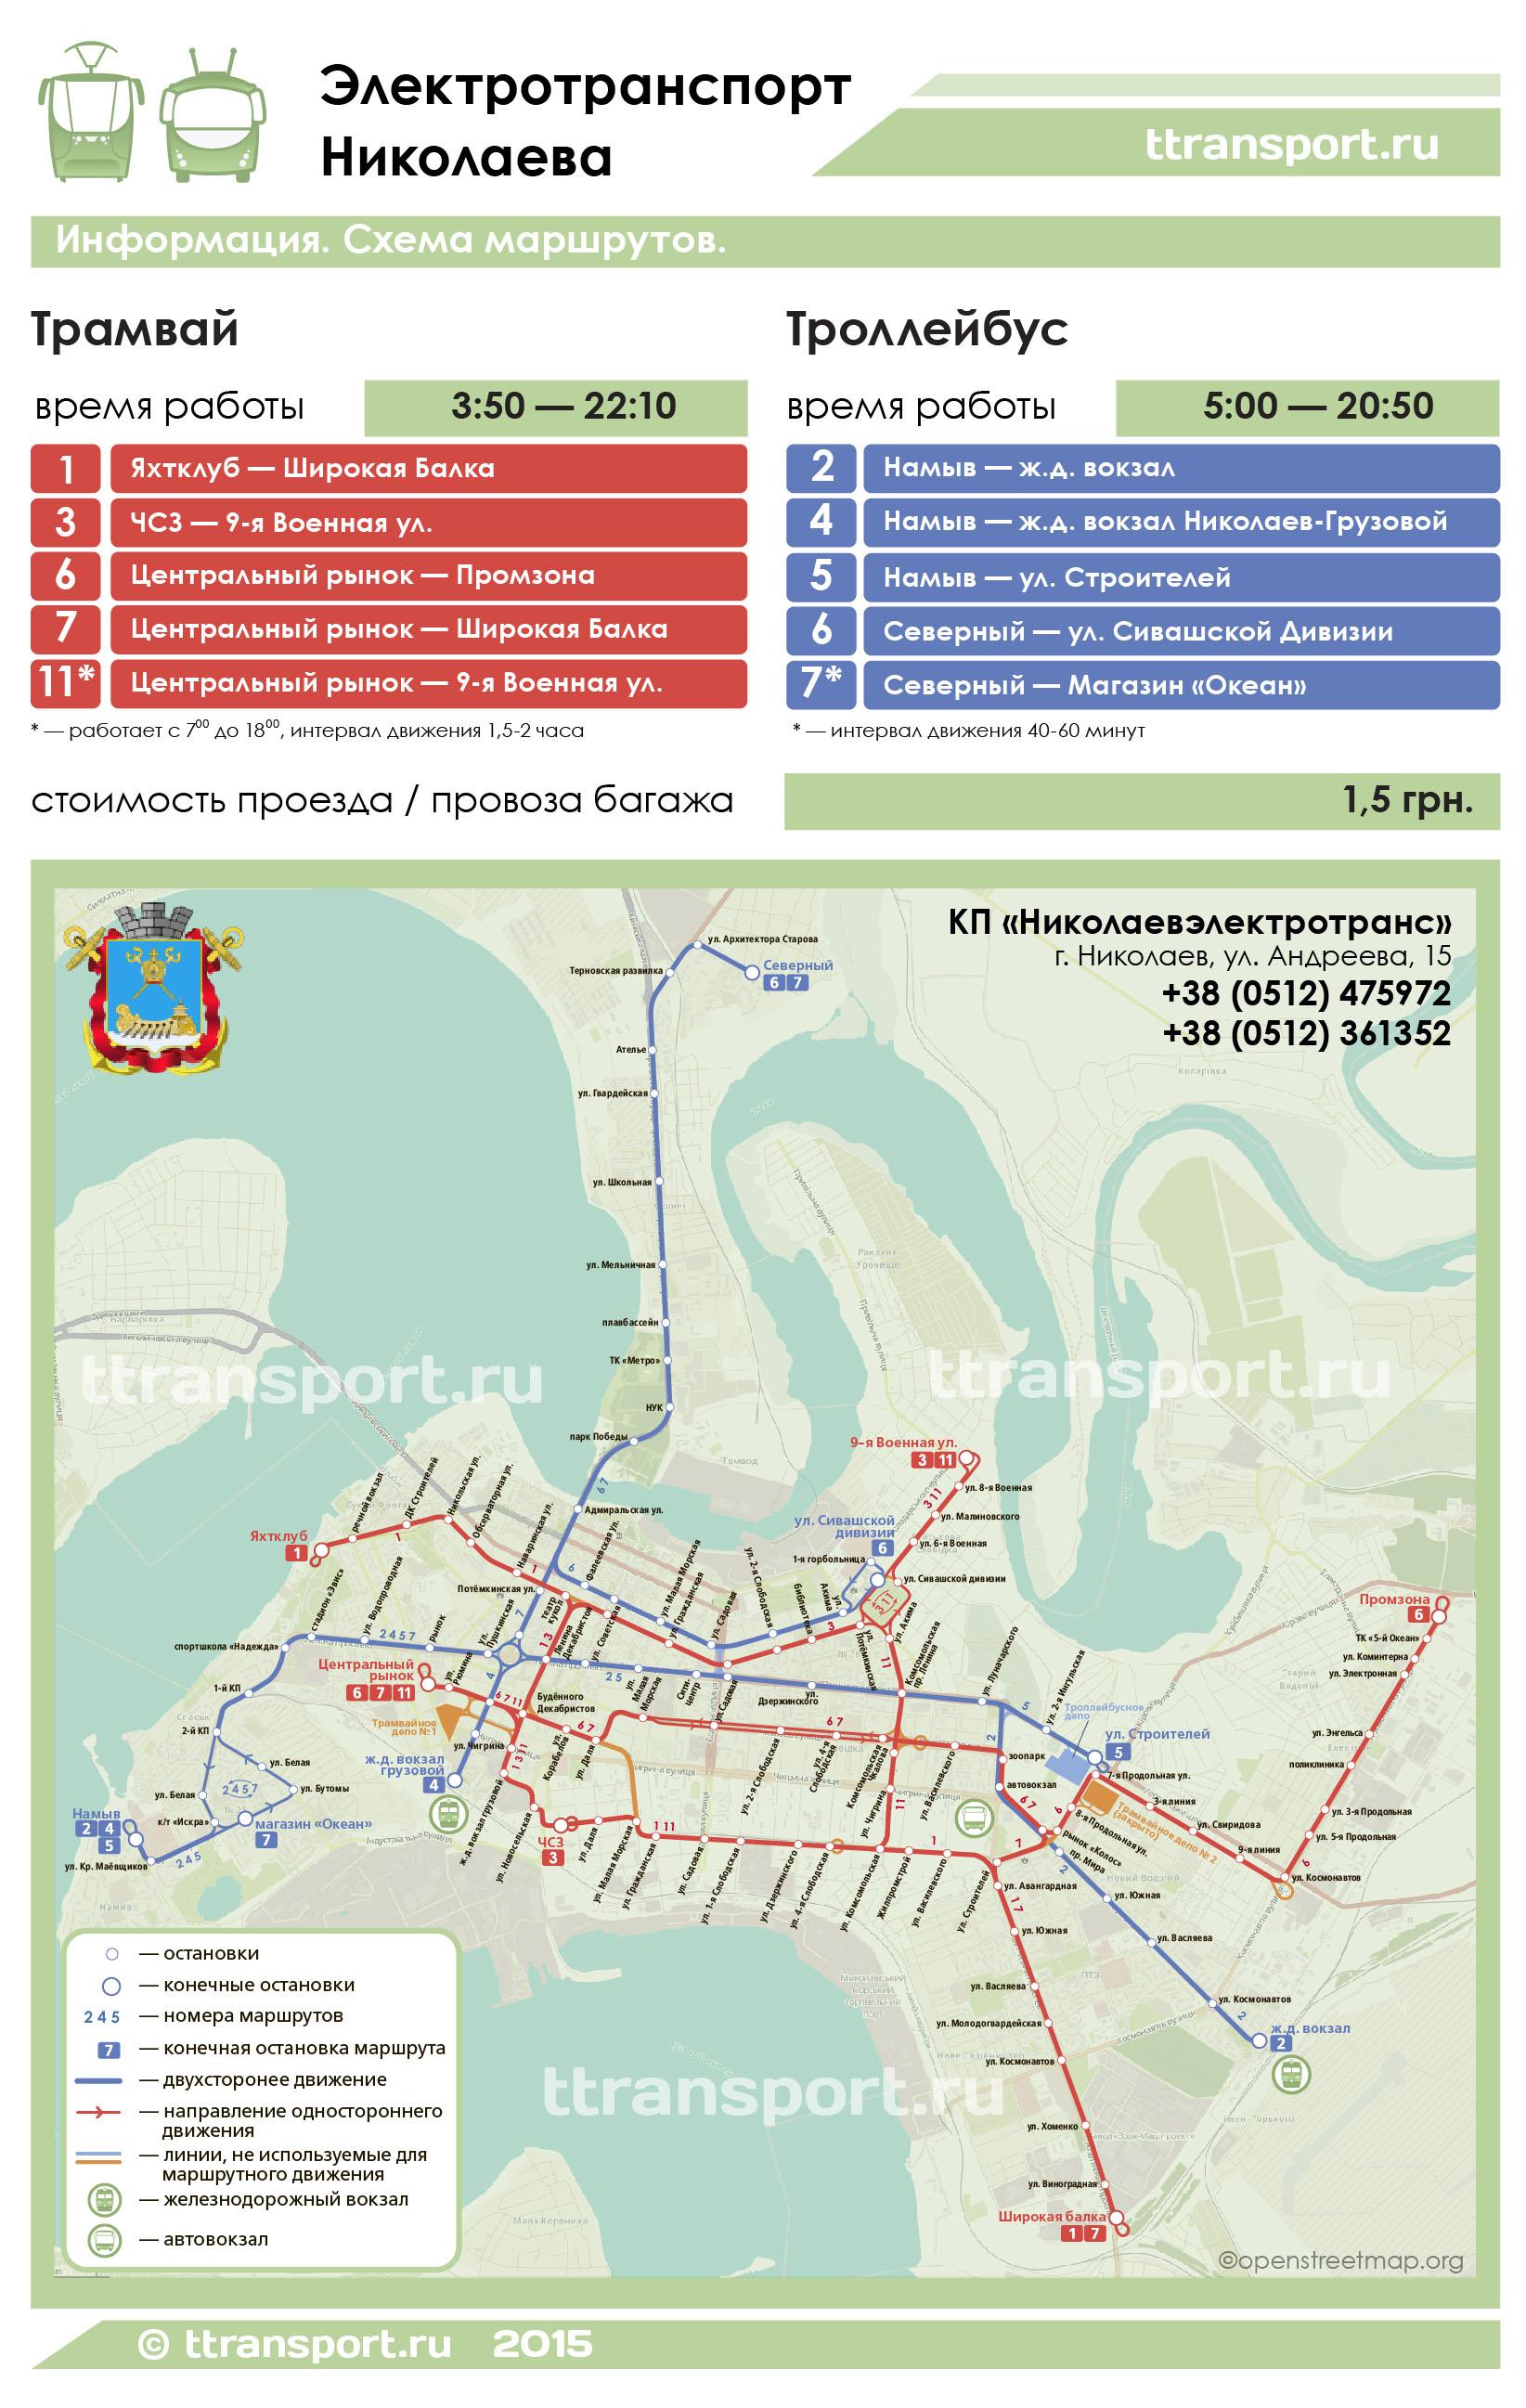 Николаев. Электротранспорт Николаева